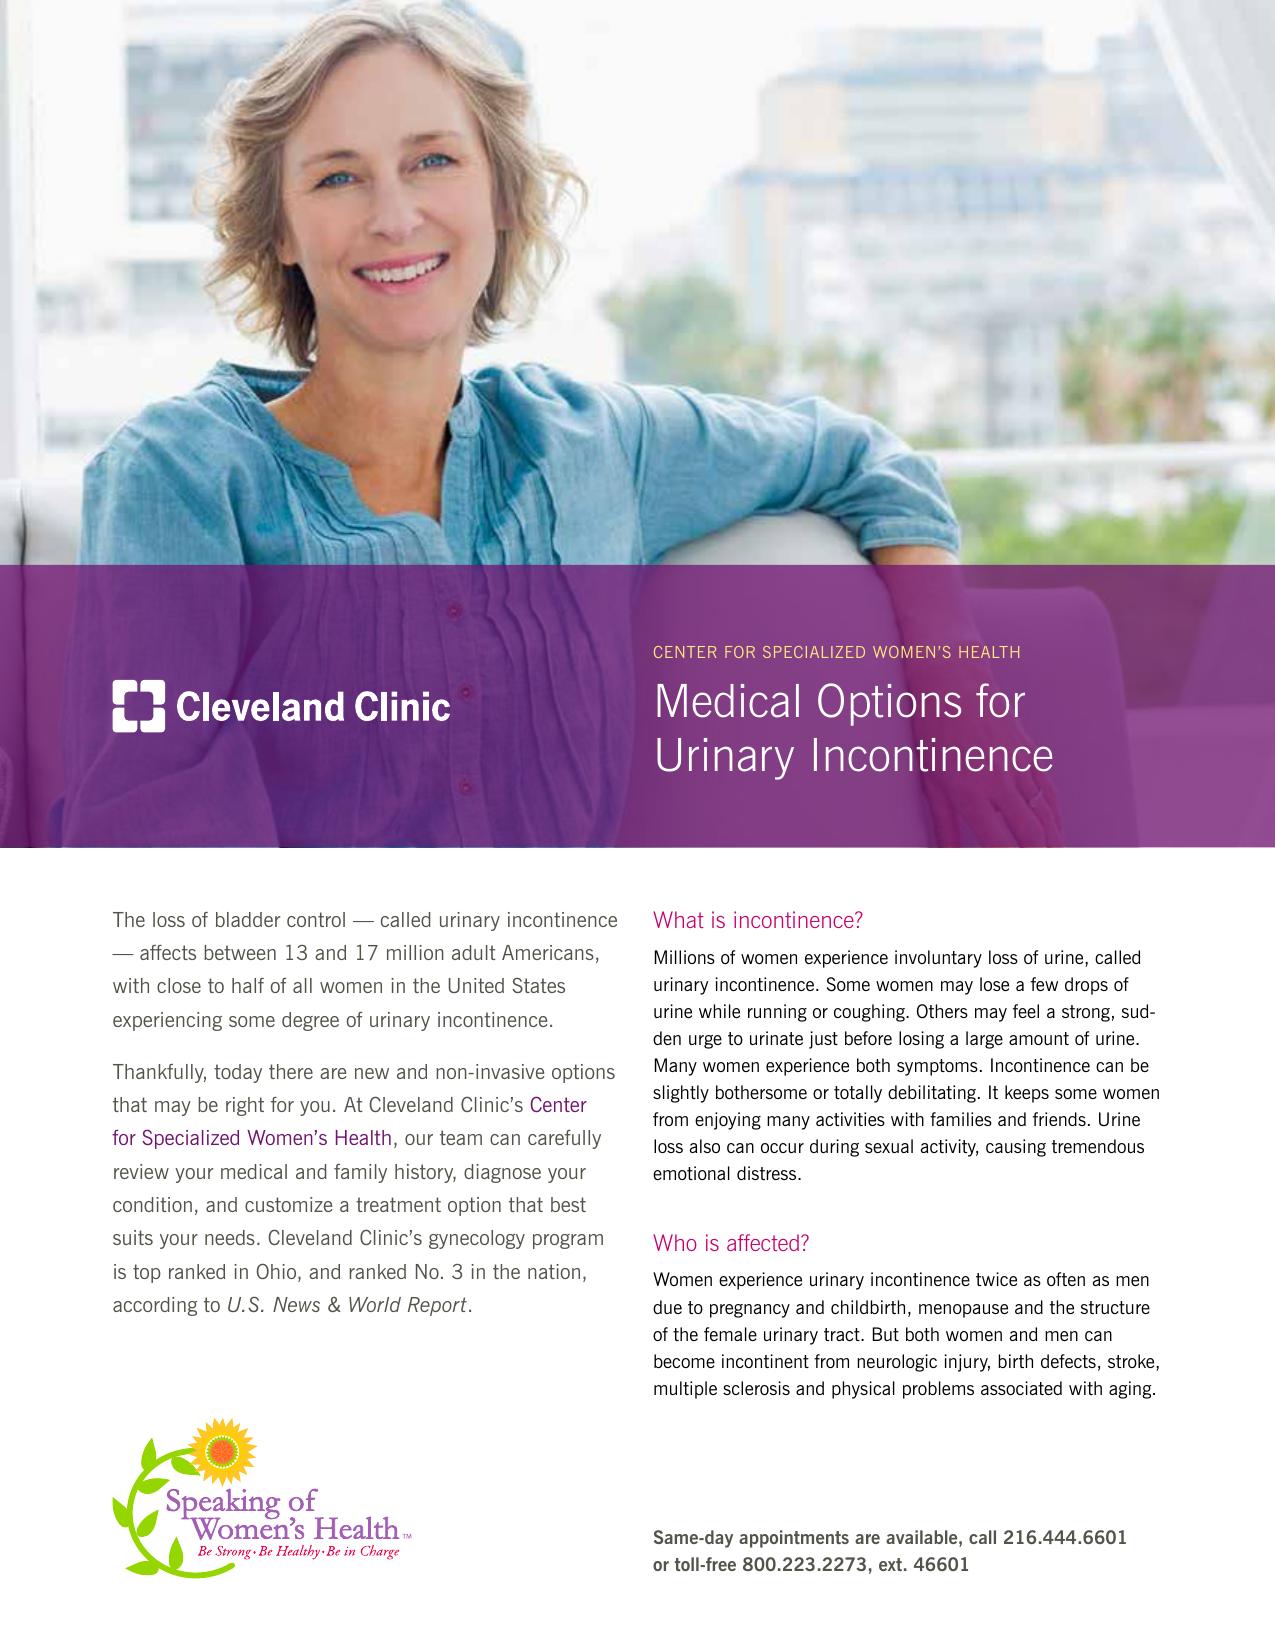 Medical Management of Urinary